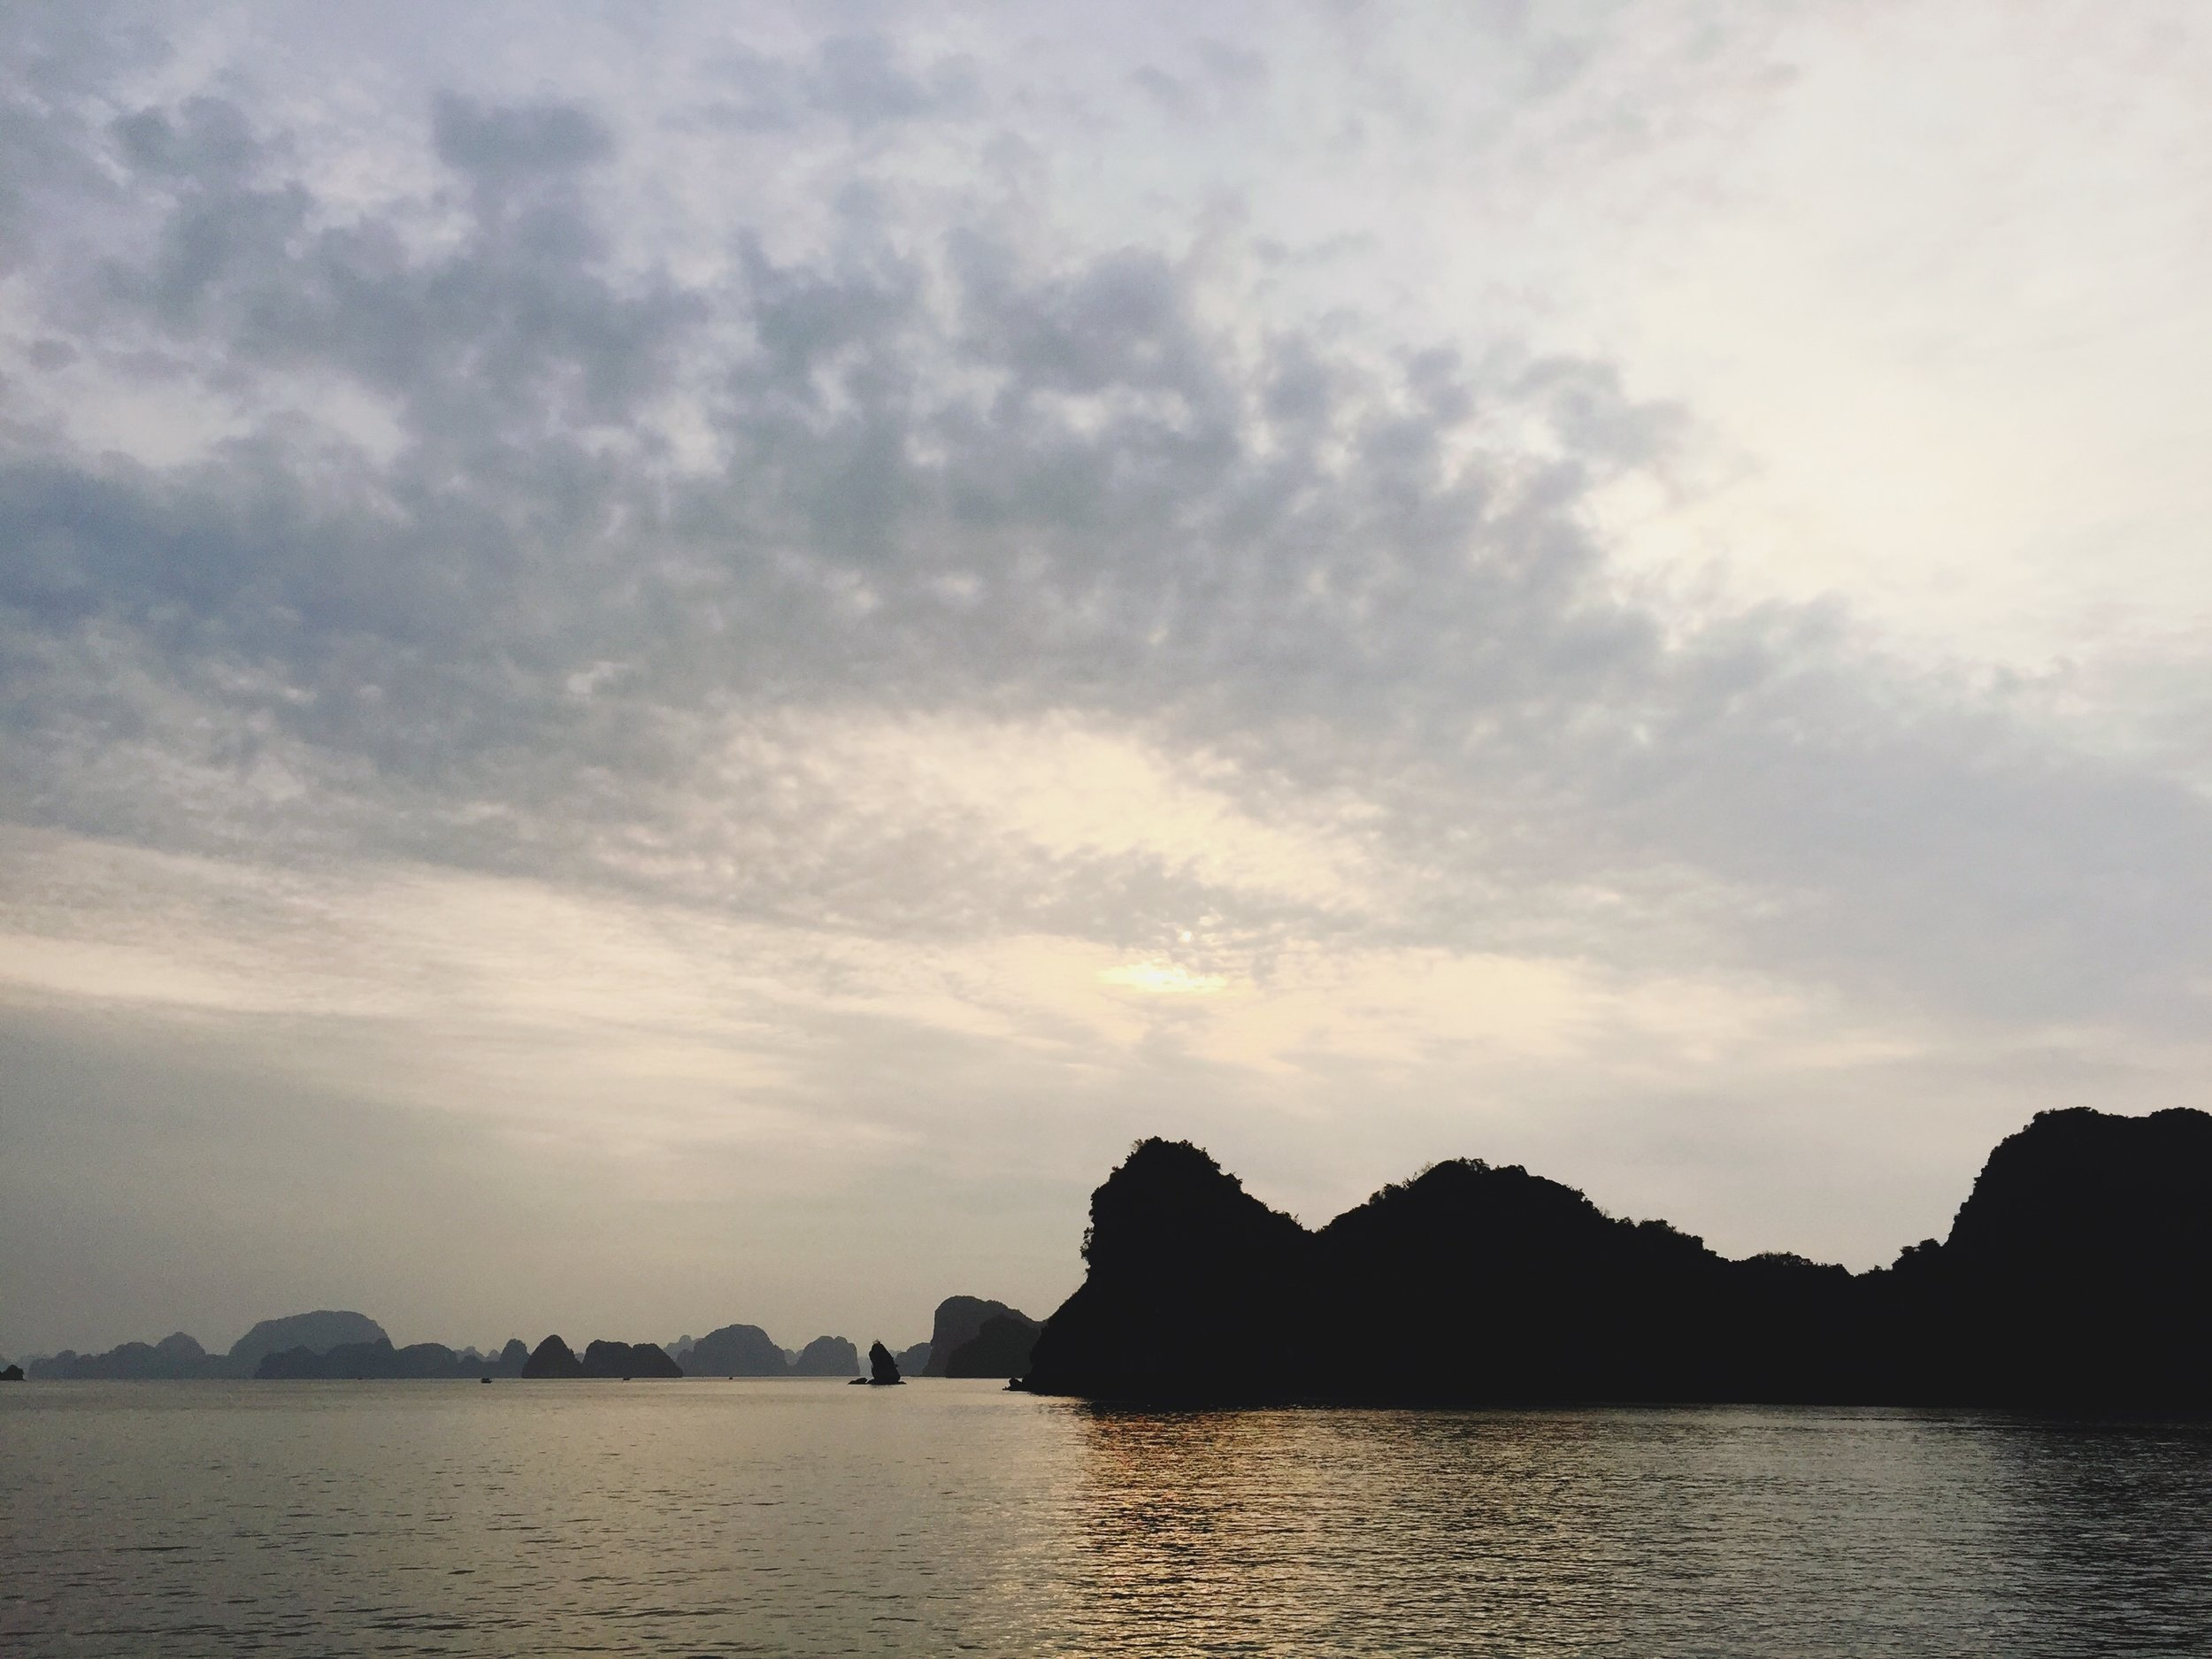 halong-bay-vietnam-trip-onmyway.JPG